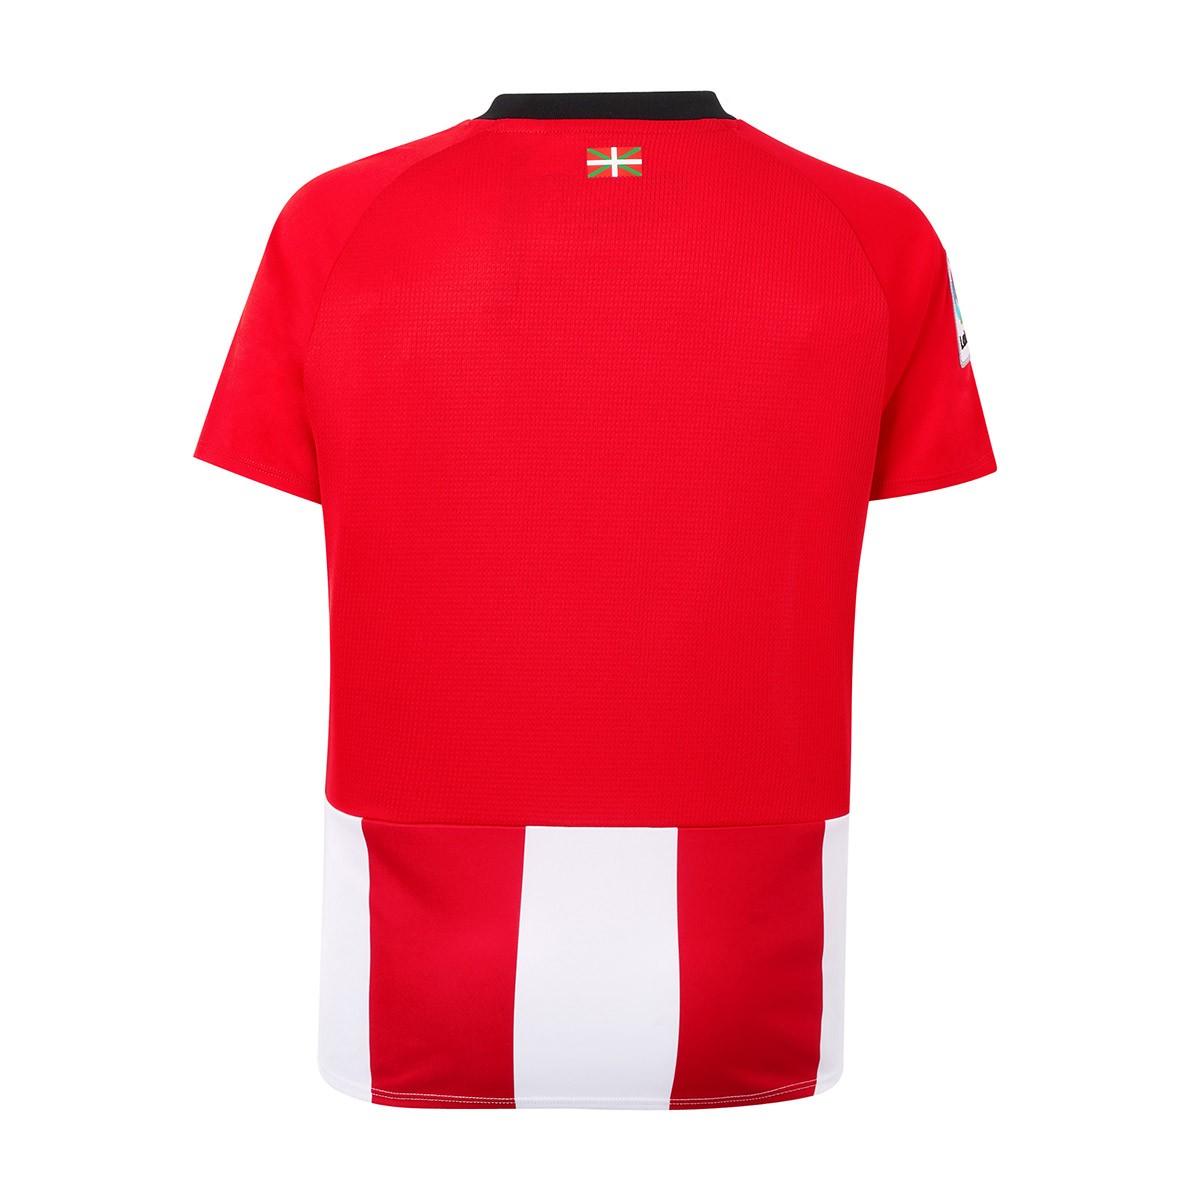 cda82a73a746c Camiseta New Balance AC Bilbao Primera Equipación 2018-2019 Niño White-Red  - Tienda de fútbol Fútbol Emotion